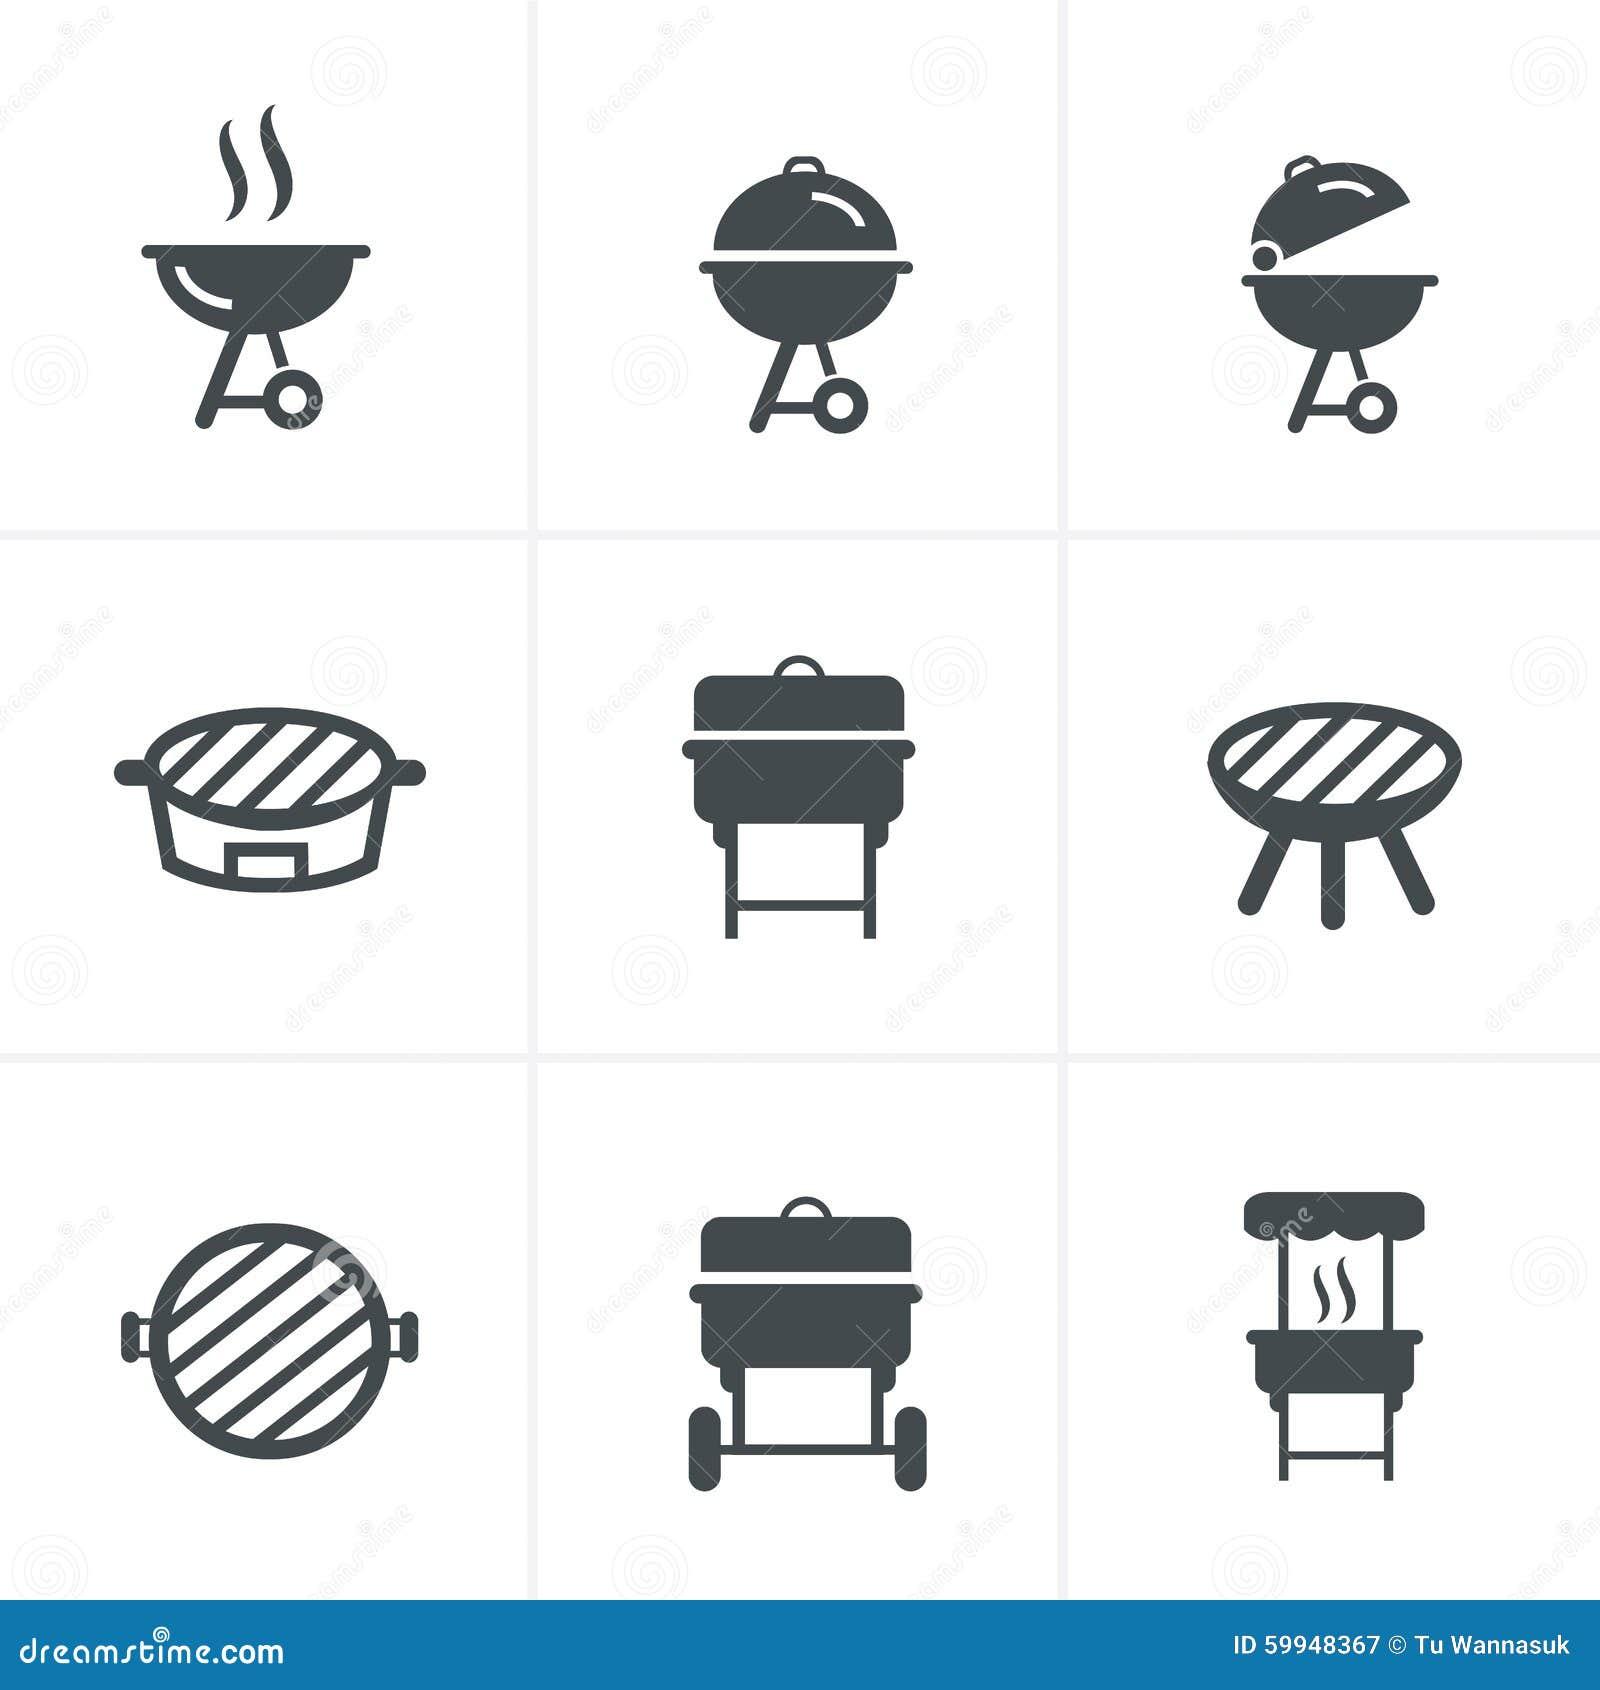 Stock Illustration Grill Icon Barbeque Symbol Design Template Image59948367